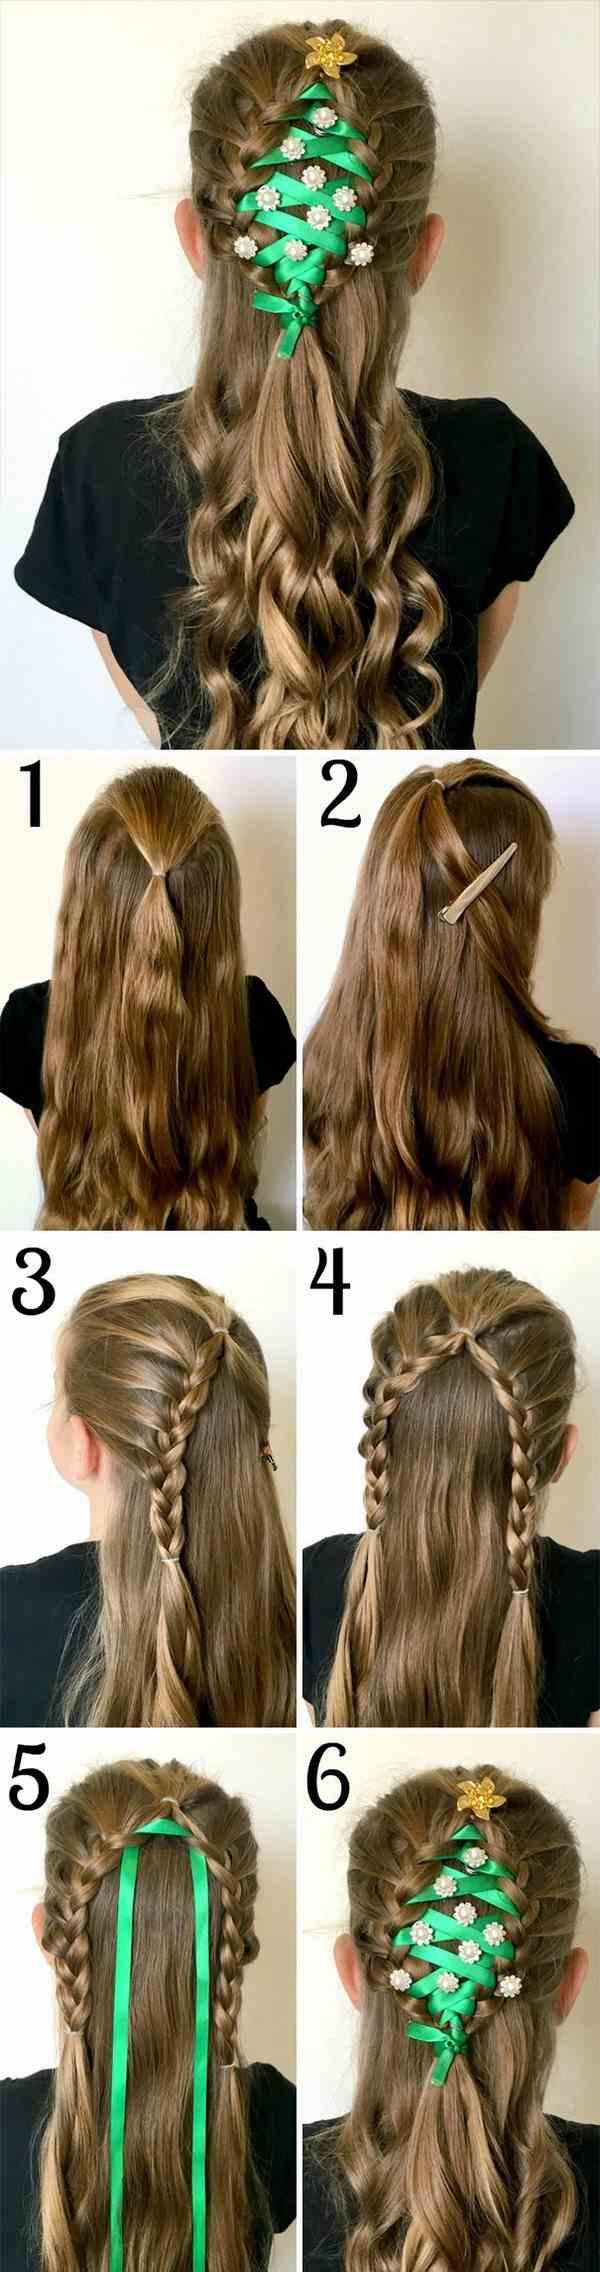 Best christmas hair ideas for girls with long hair cute christmas